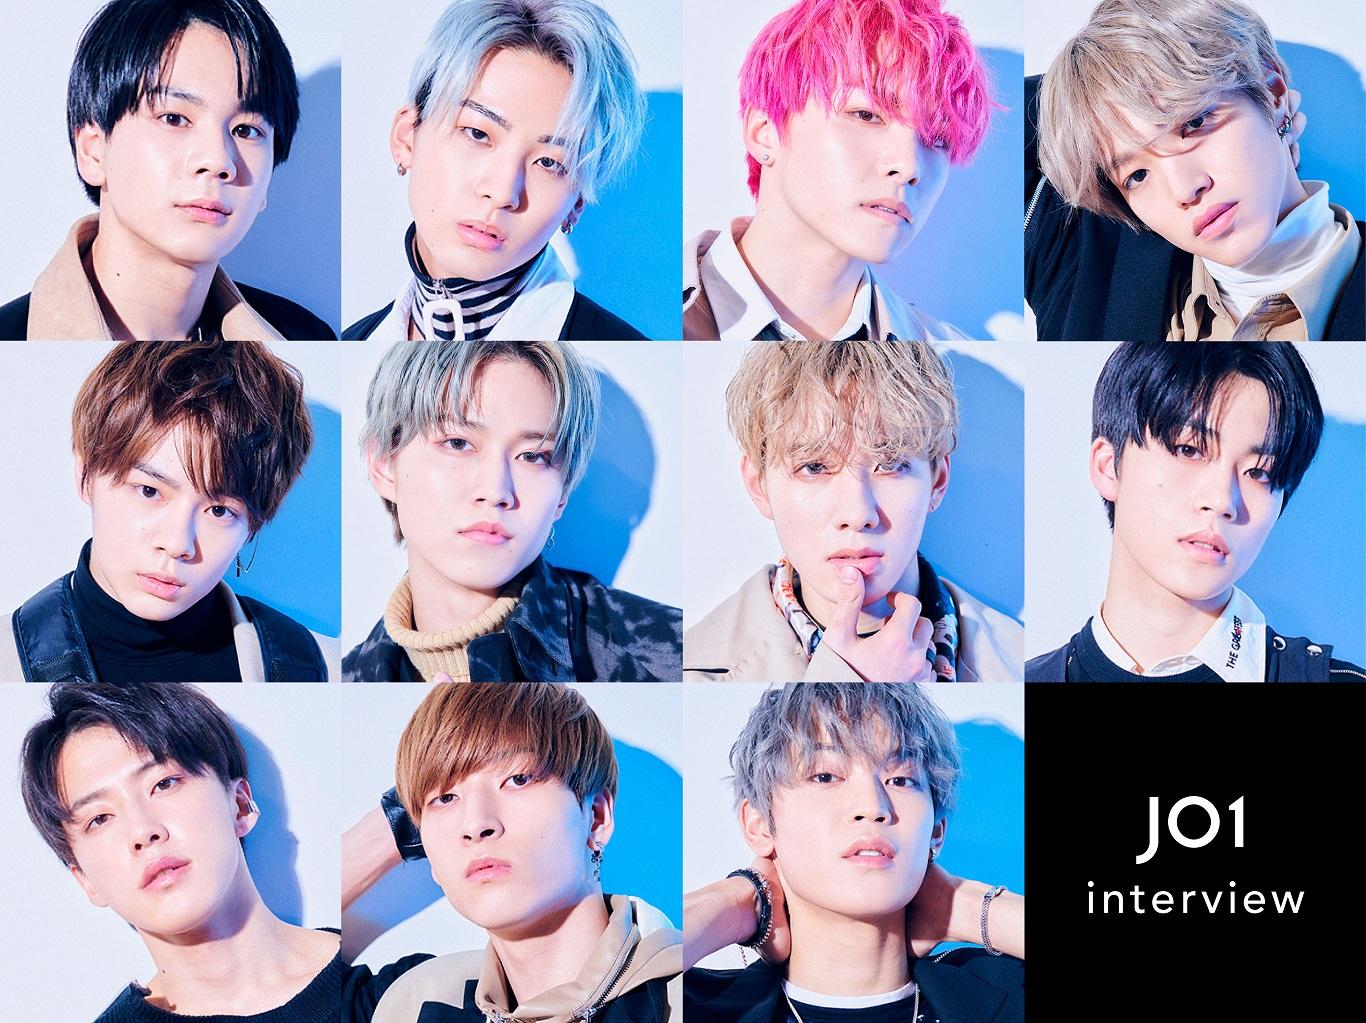 JO1メンバーの写真付きプロフィール!年齢や身長は?人気順も公開!